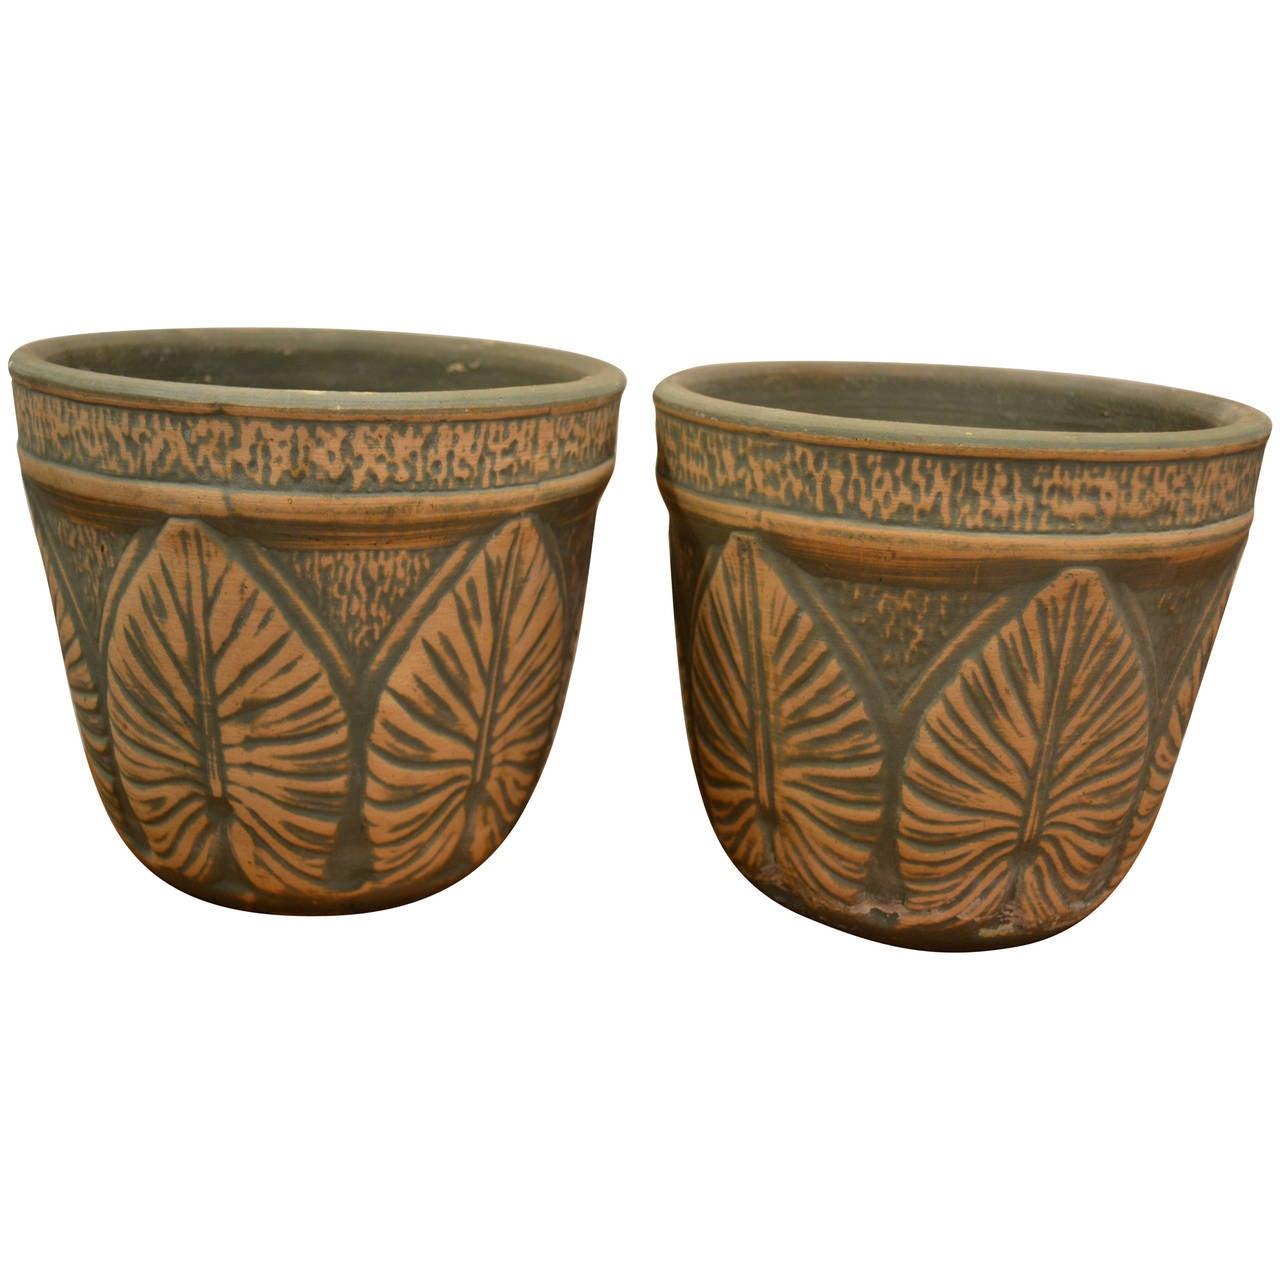 Pair Of Art Deco Lotus Leaf Garden Pots At 1stdibs